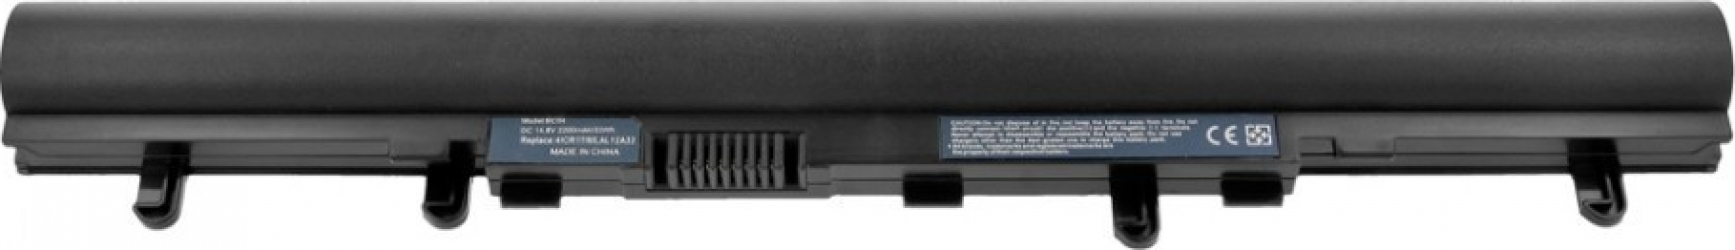 Baterie Laptop Eco Box Acer Aspire V5